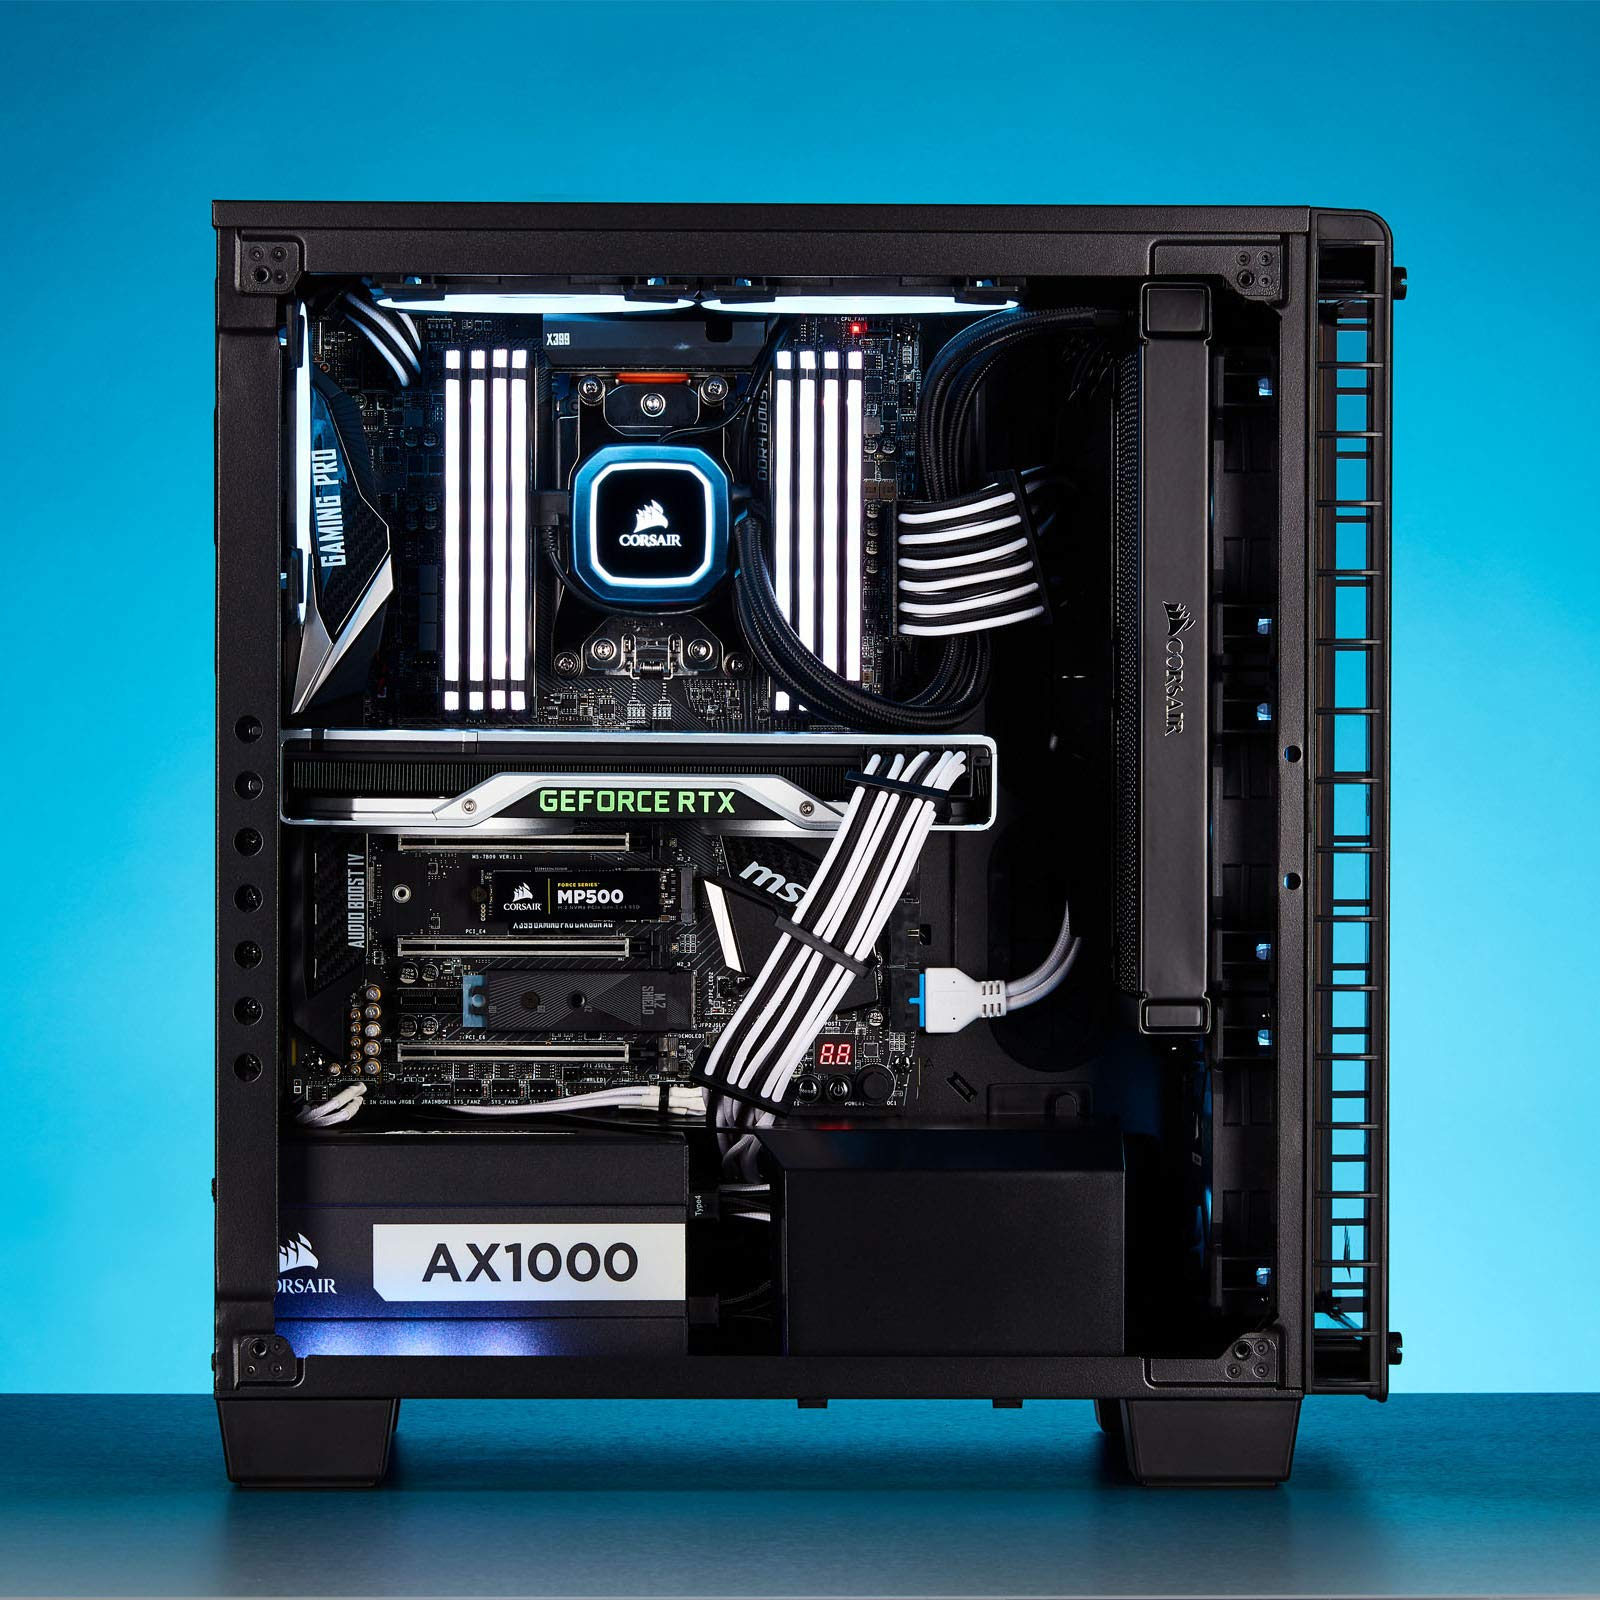 CORSAIR Premium Individually Sleeved PSU Cables Starter Kit - Black, 2 Yr Warranty, for Corsair PSUs by Corsair (Image #12)